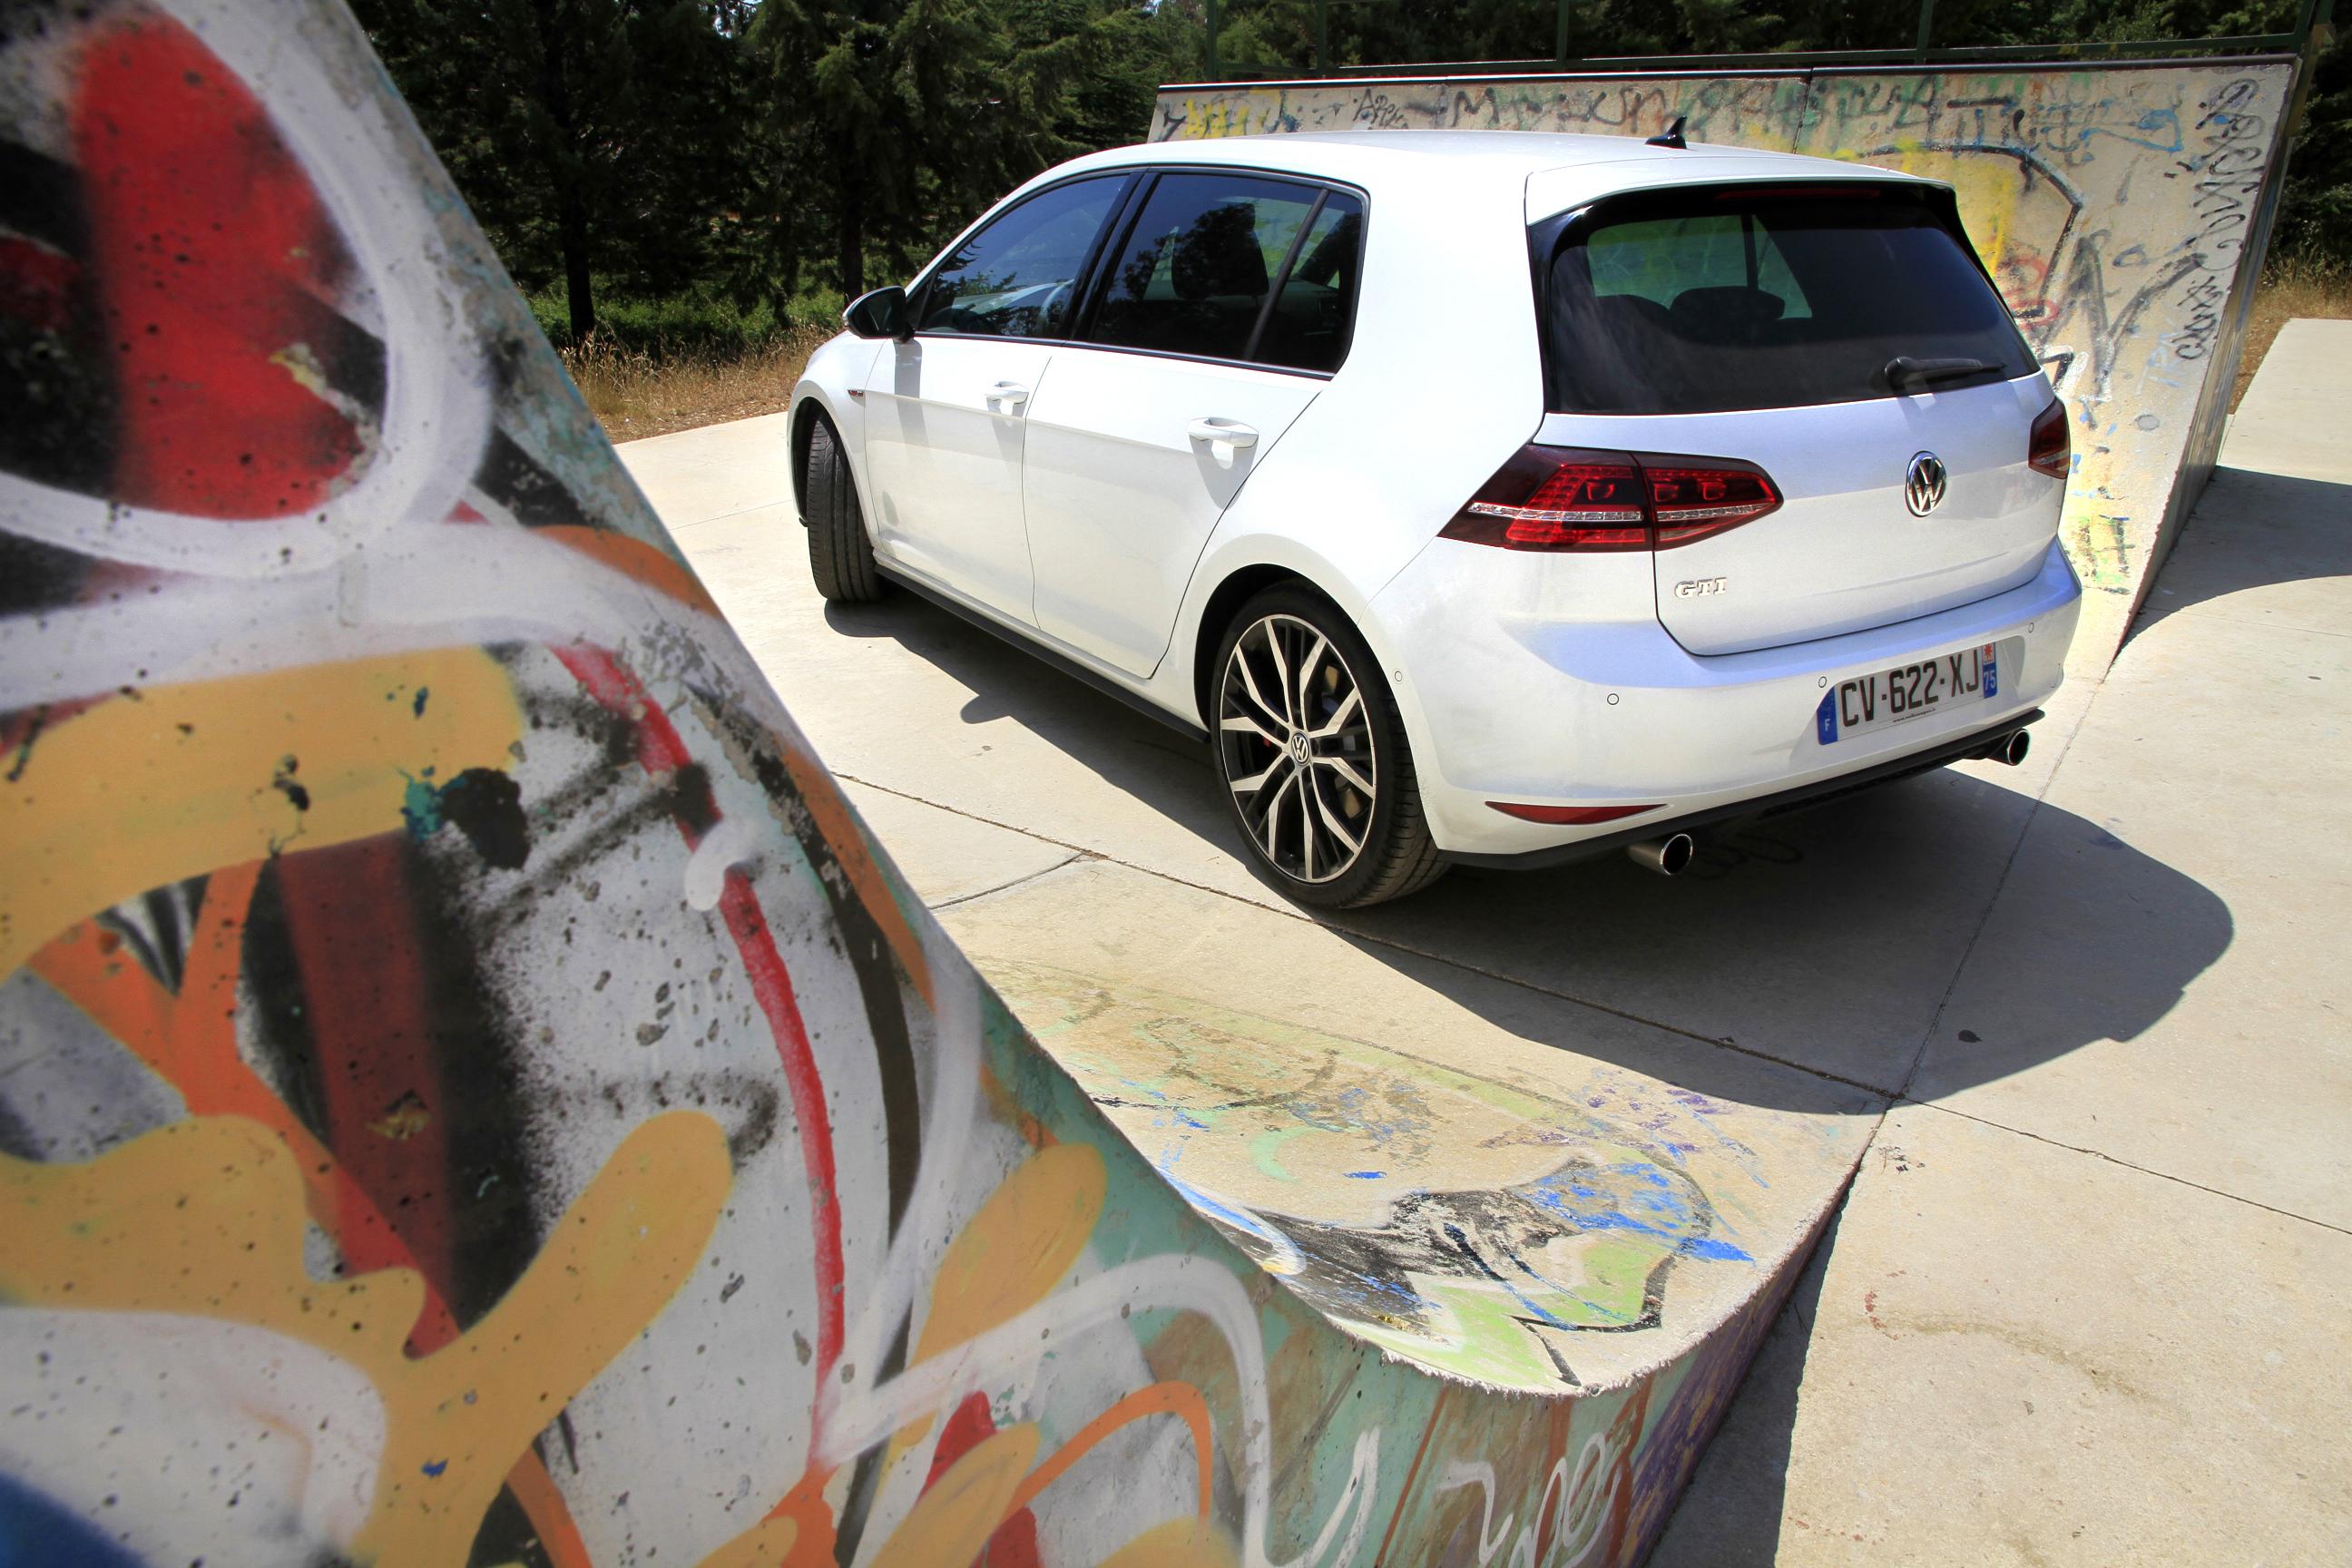 http://images.caradisiac.com/images/7/9/6/0/87960/S0-Essai-video-Volkswagen-Golf-GTI-7-Grand-mere-est-une-rockstar-297845.jpg